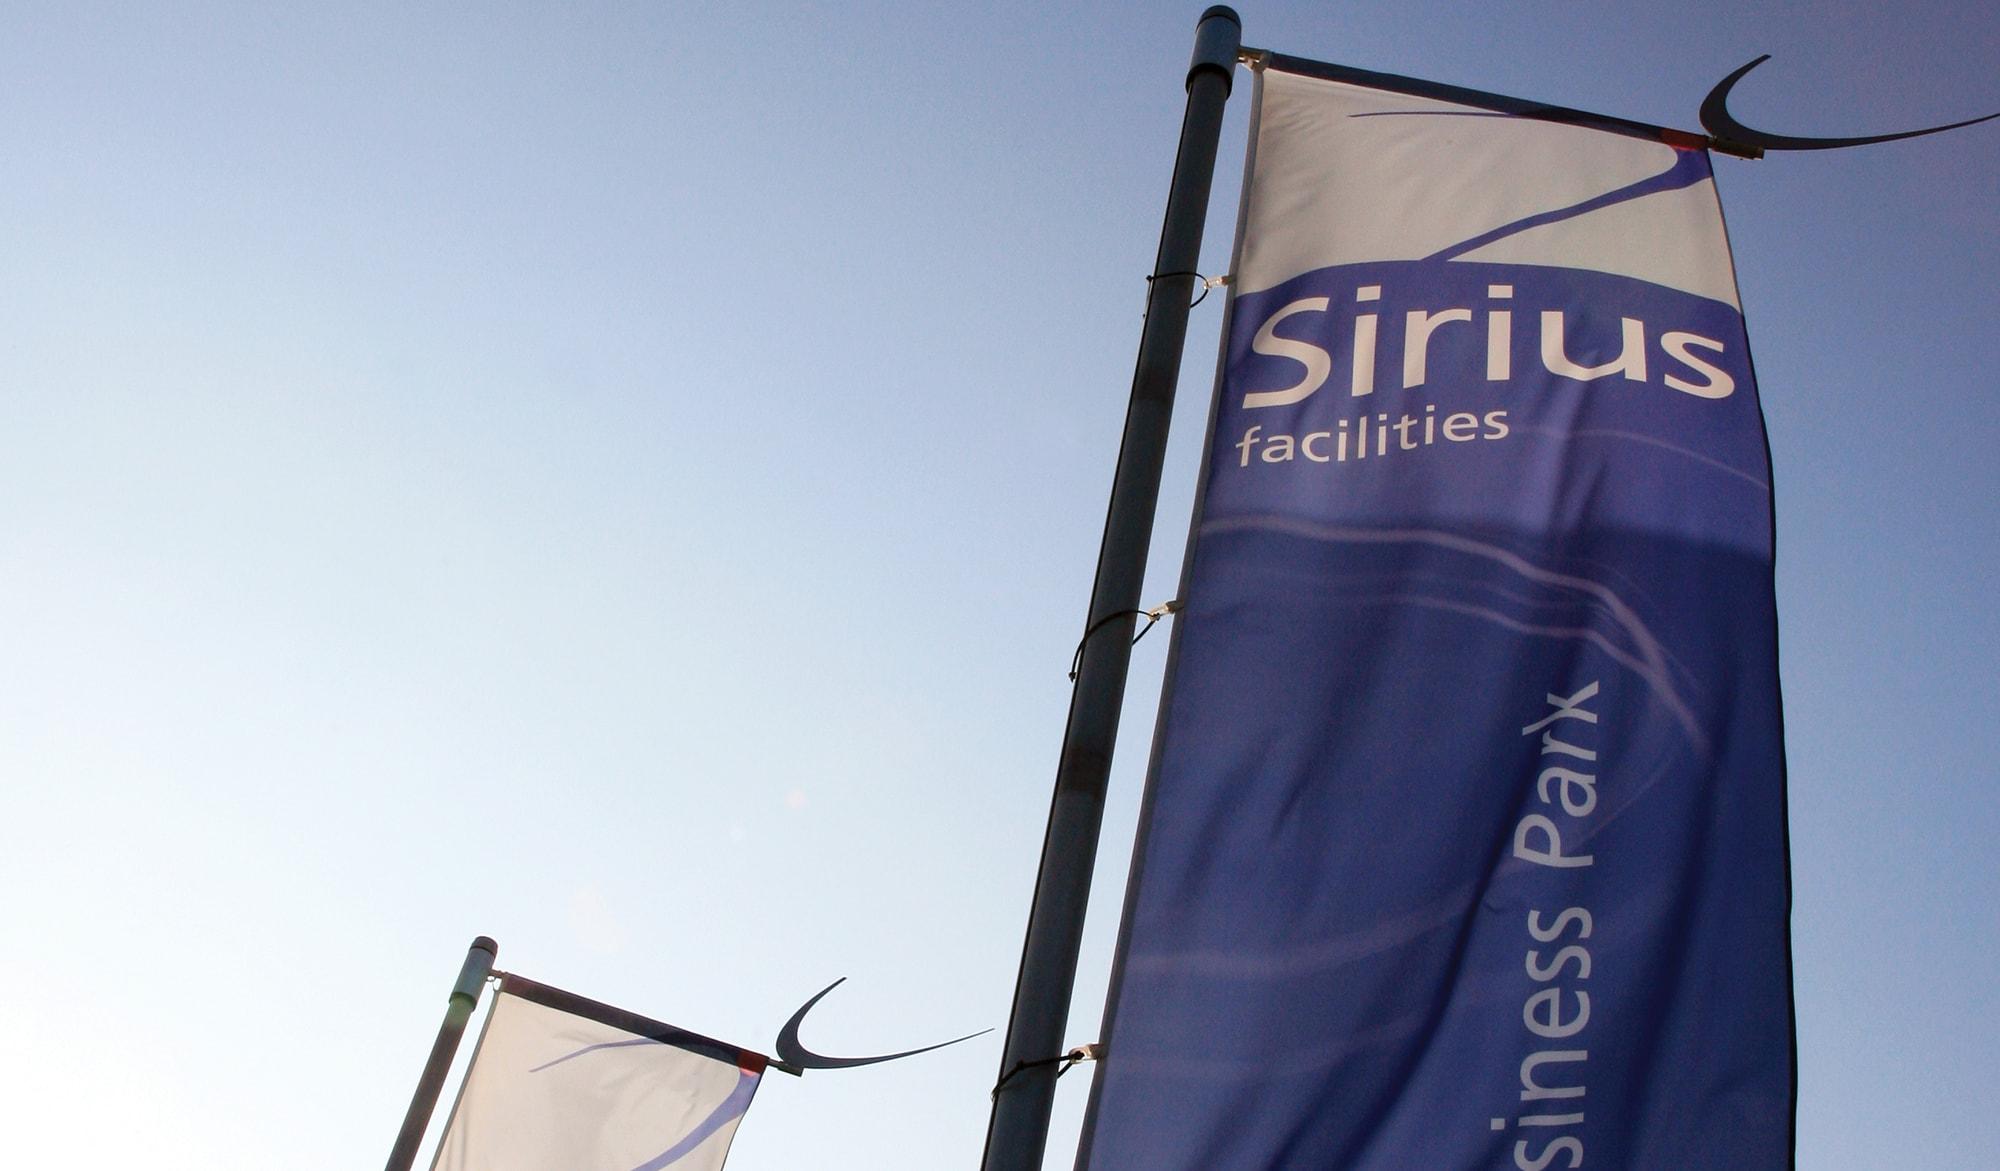 Sirius Facilities flags